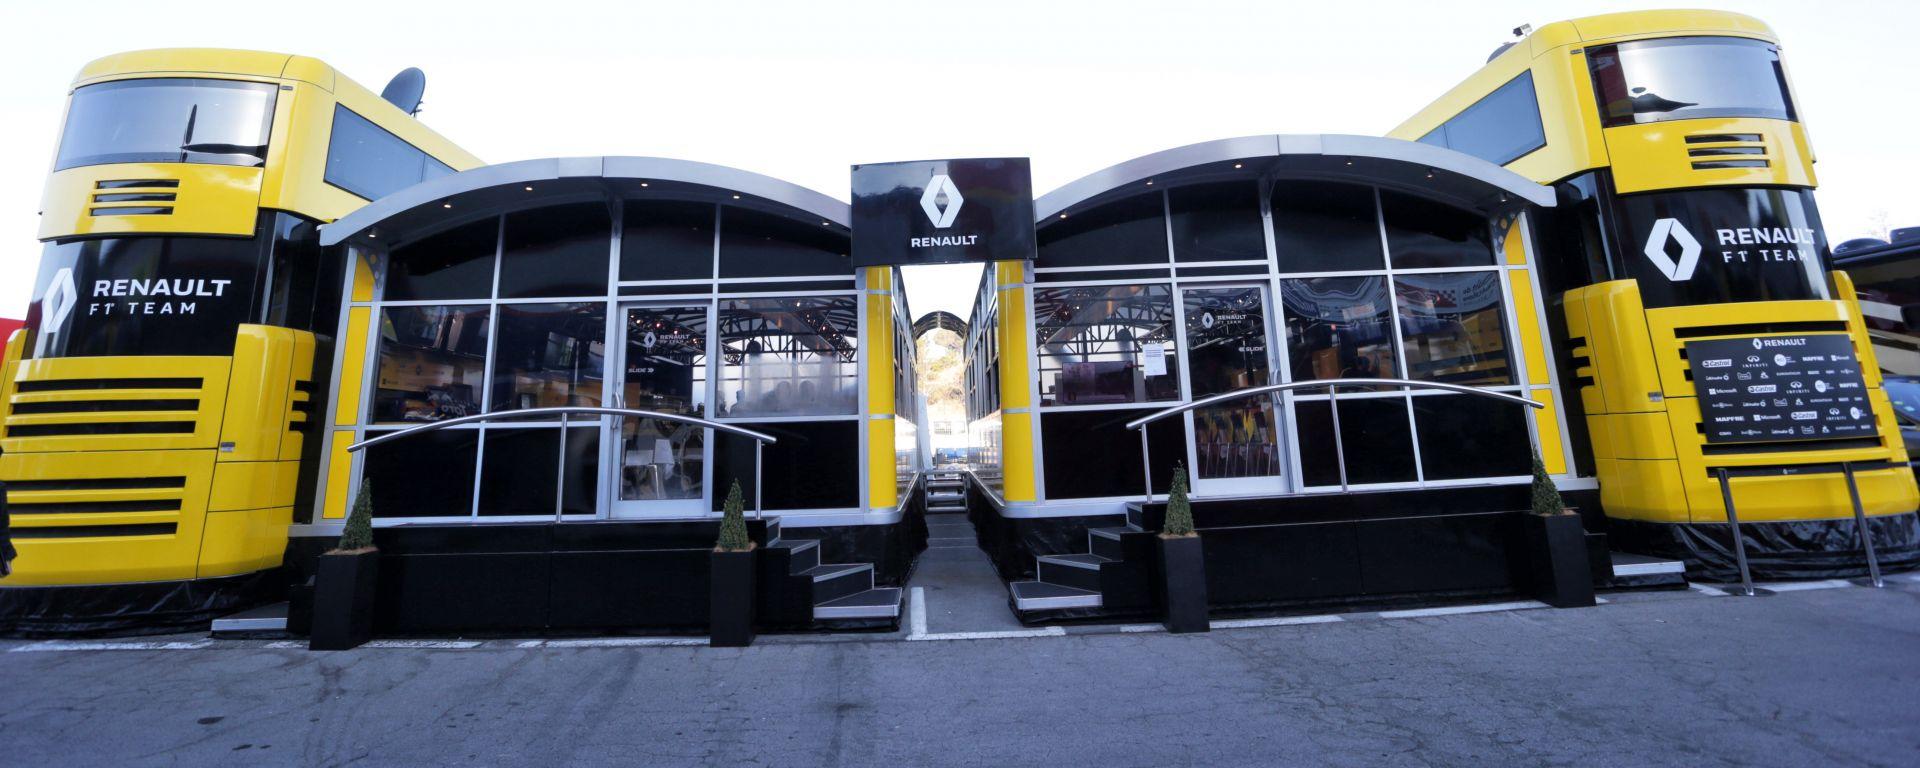 F1: l'hospitality Renault nel paddock